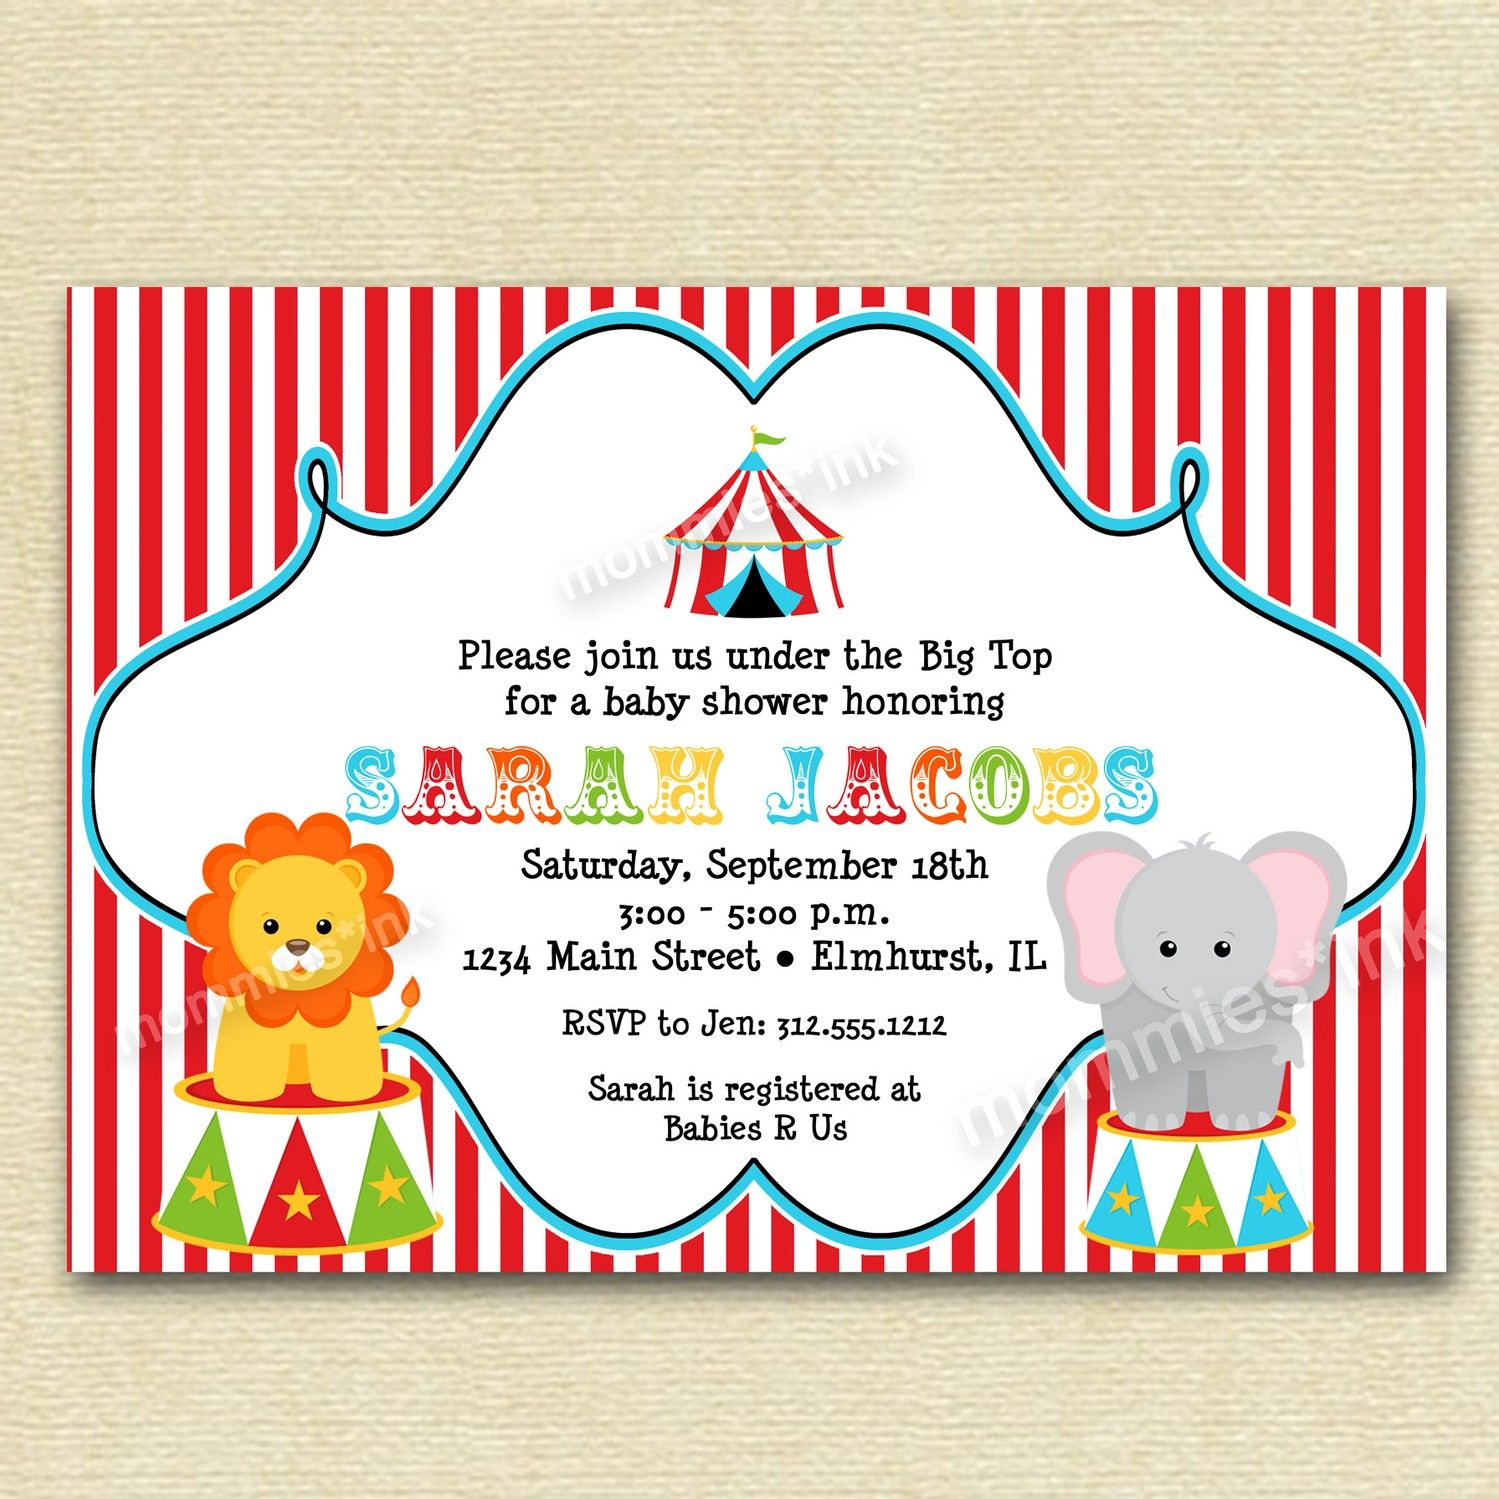 Circus Top Baby Shower Invitation Printable Design 12 50 Via Etsy